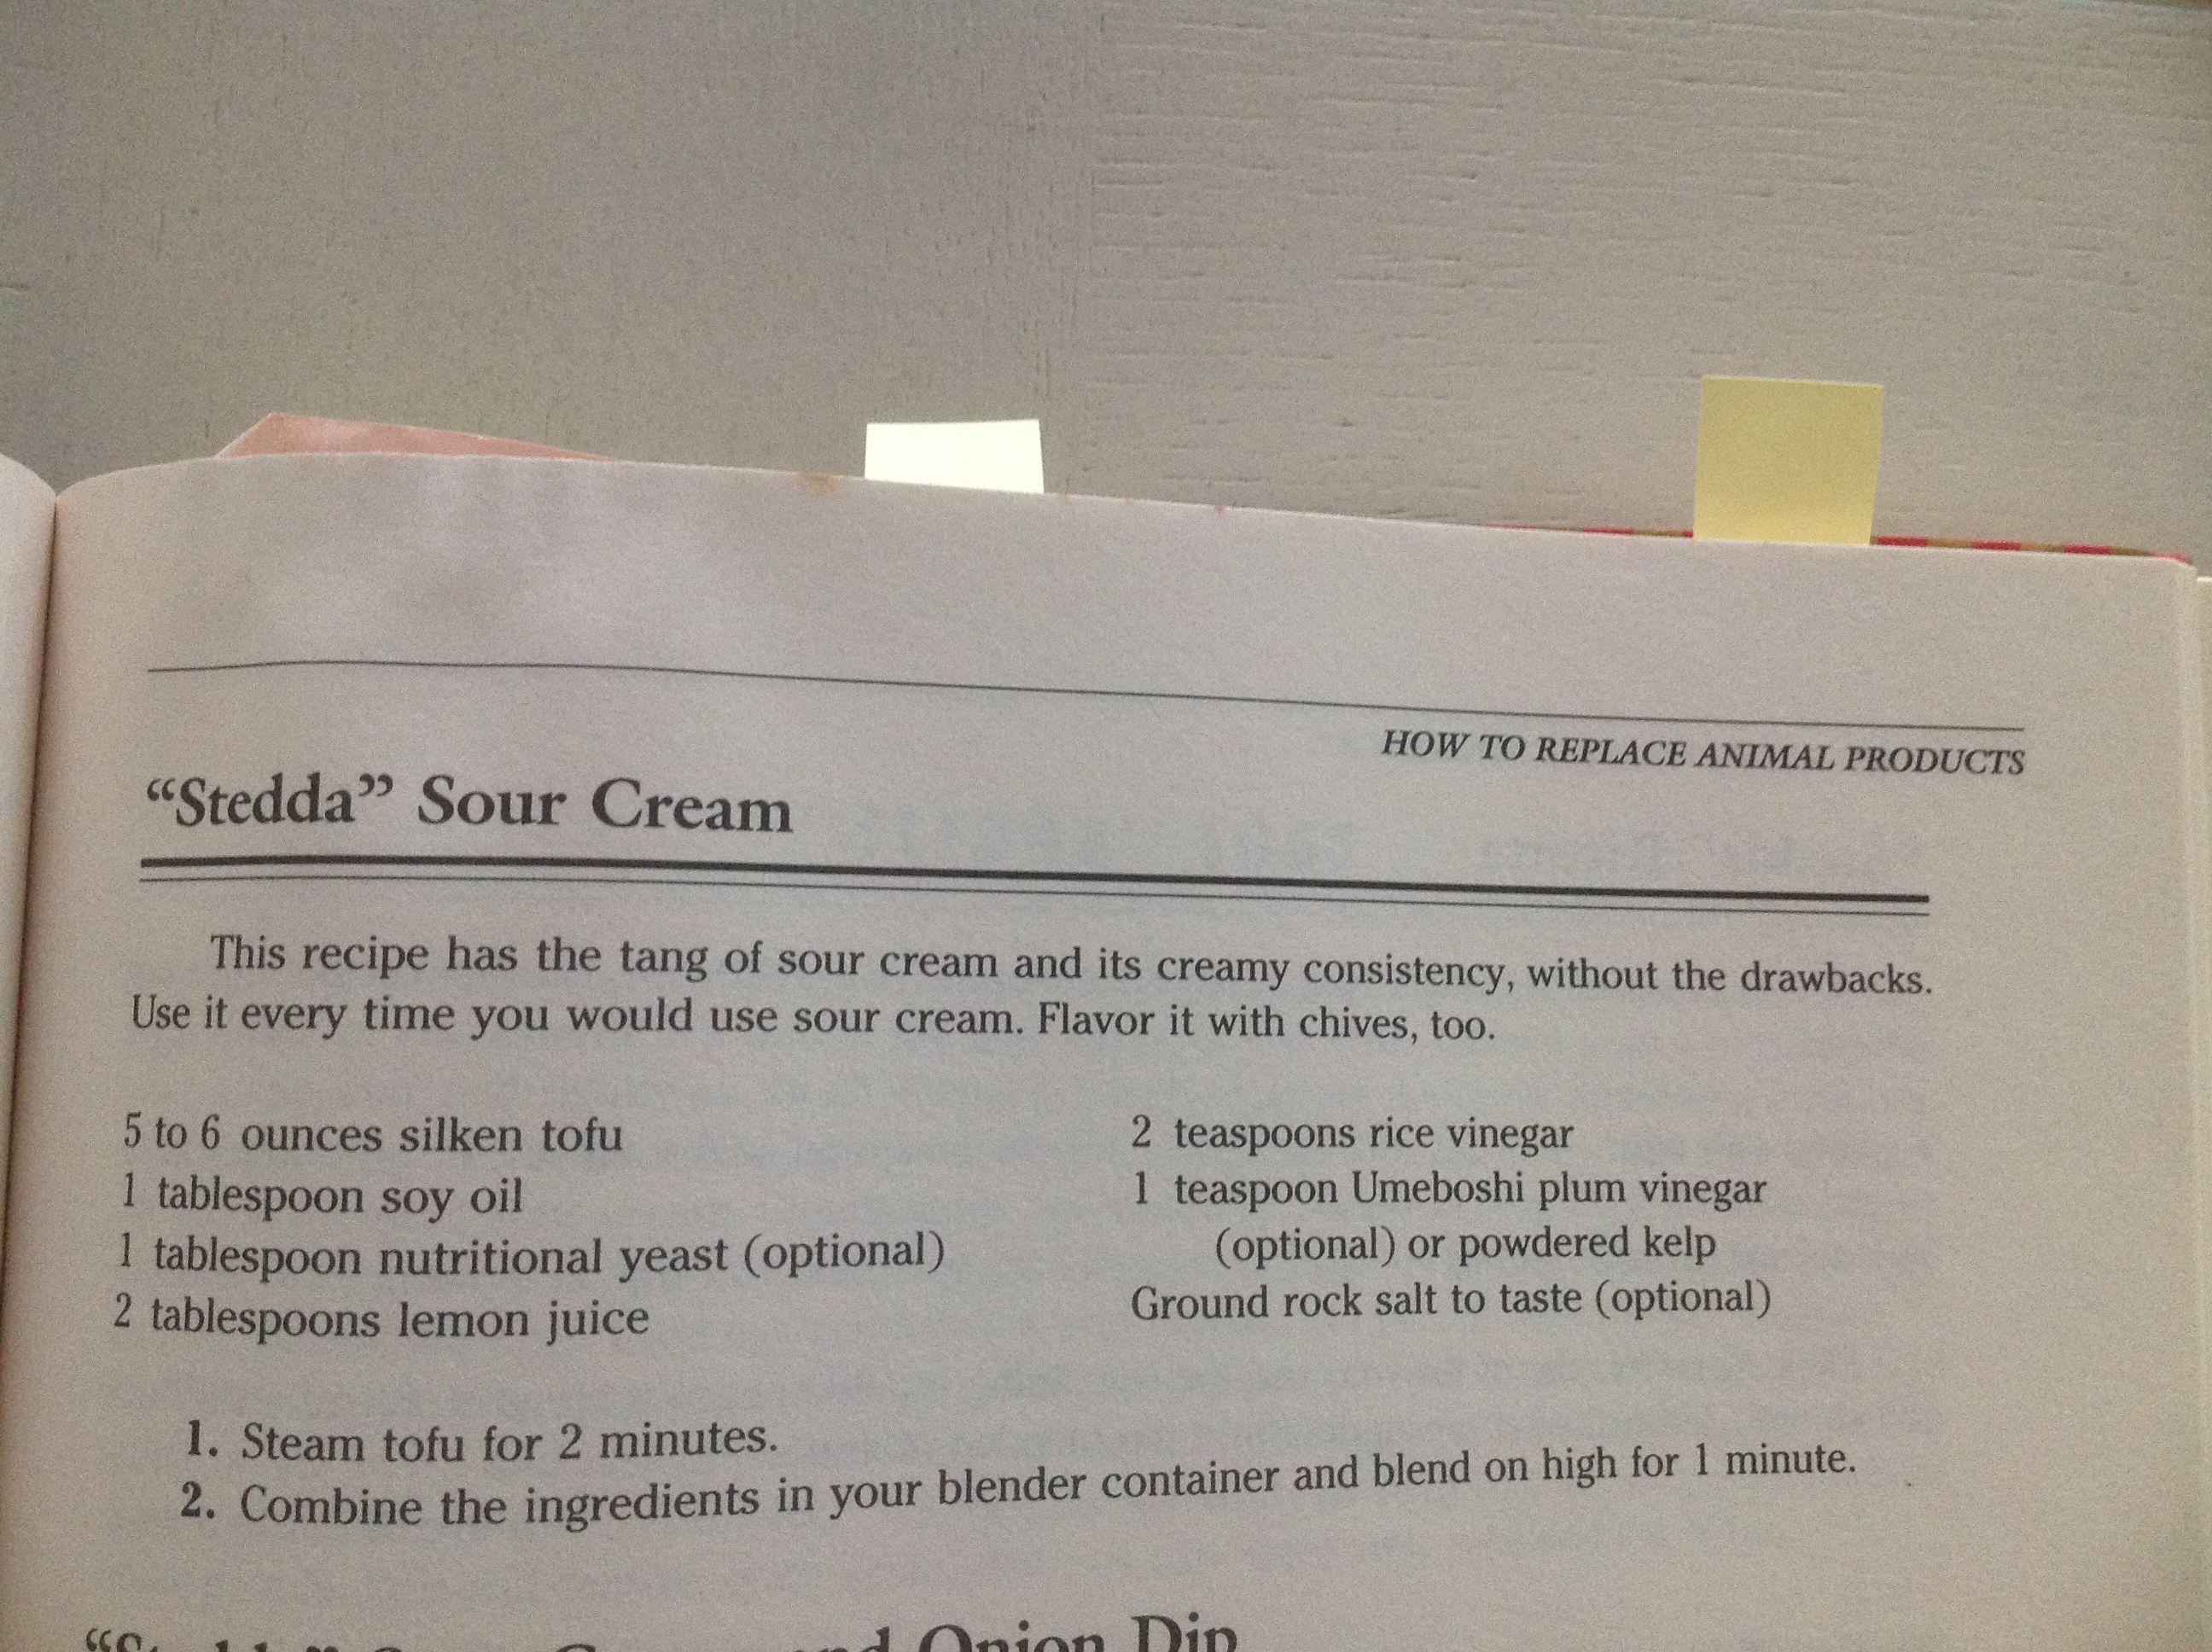 Stedda Sour Cream From American Vegetarian Cookbook By Marilyn Diamond Vegan Sour Cream Vegan Sour Cream Vegetarian Cookbook Sour Cream